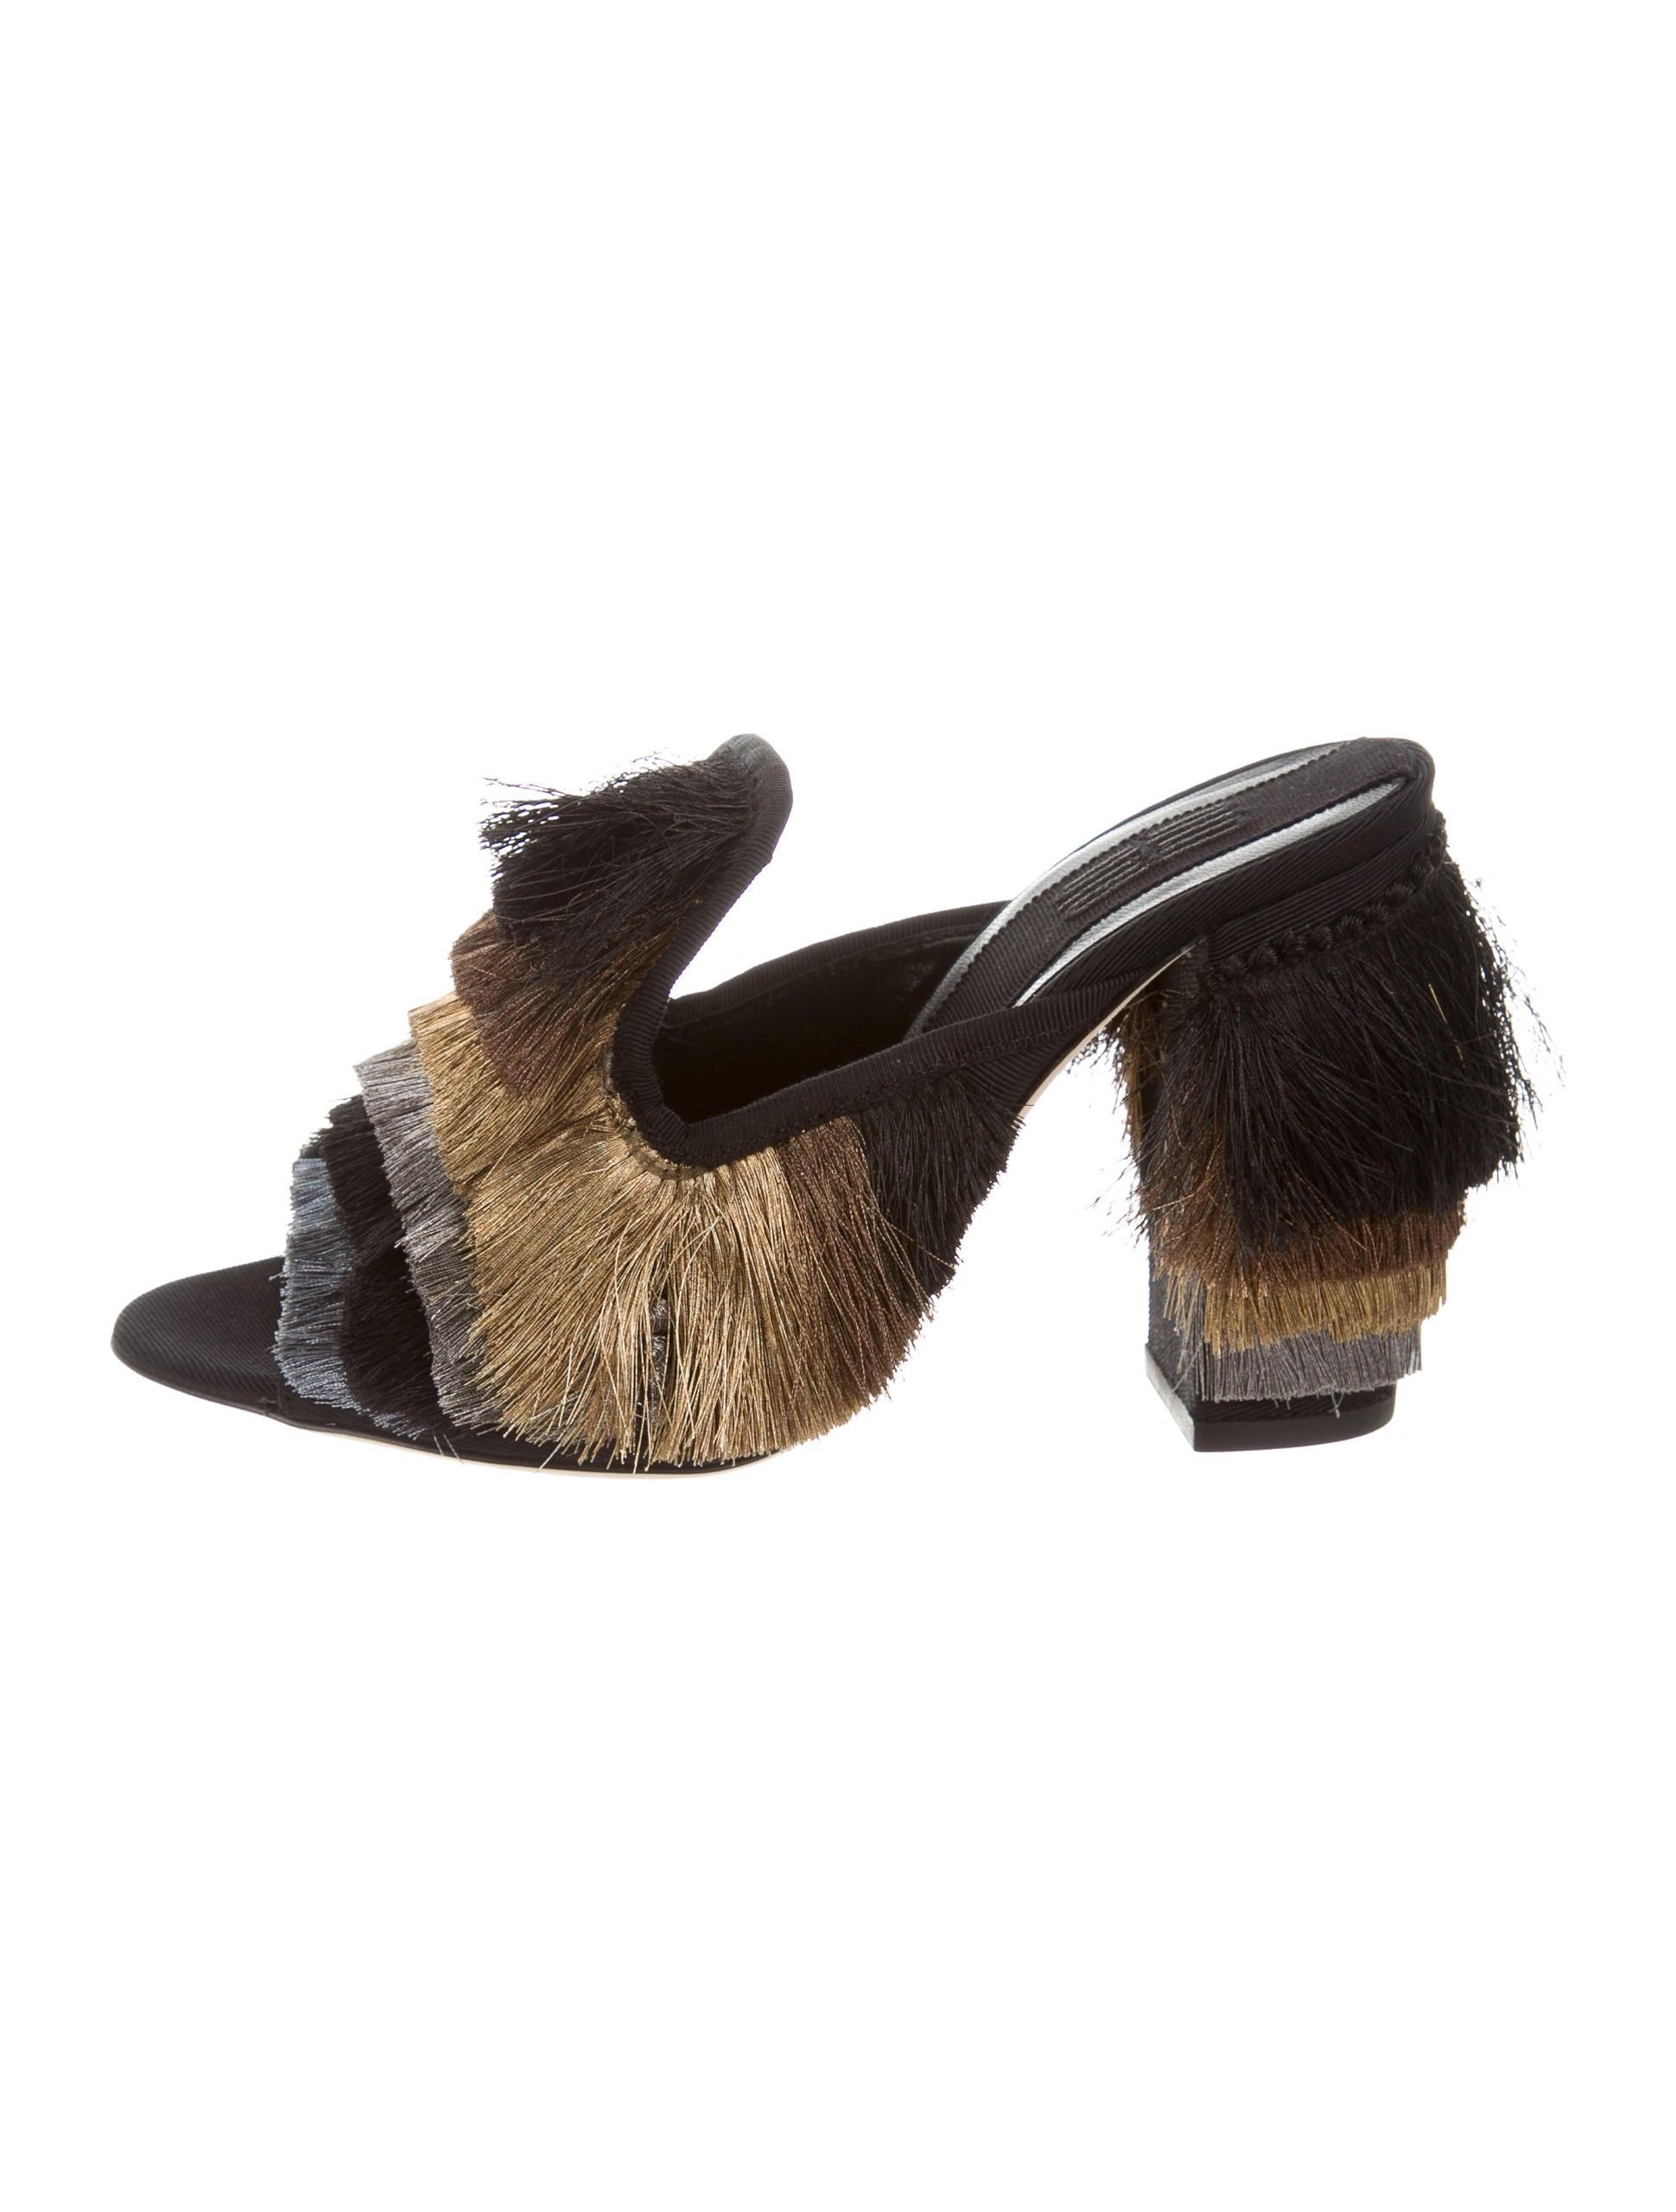 free shipping hot sale Sanayi 313 Cascata Fringe Sandals w/ Tags ebay cheap price sale explore clearance 2014 newest Mu8H5FurkZ